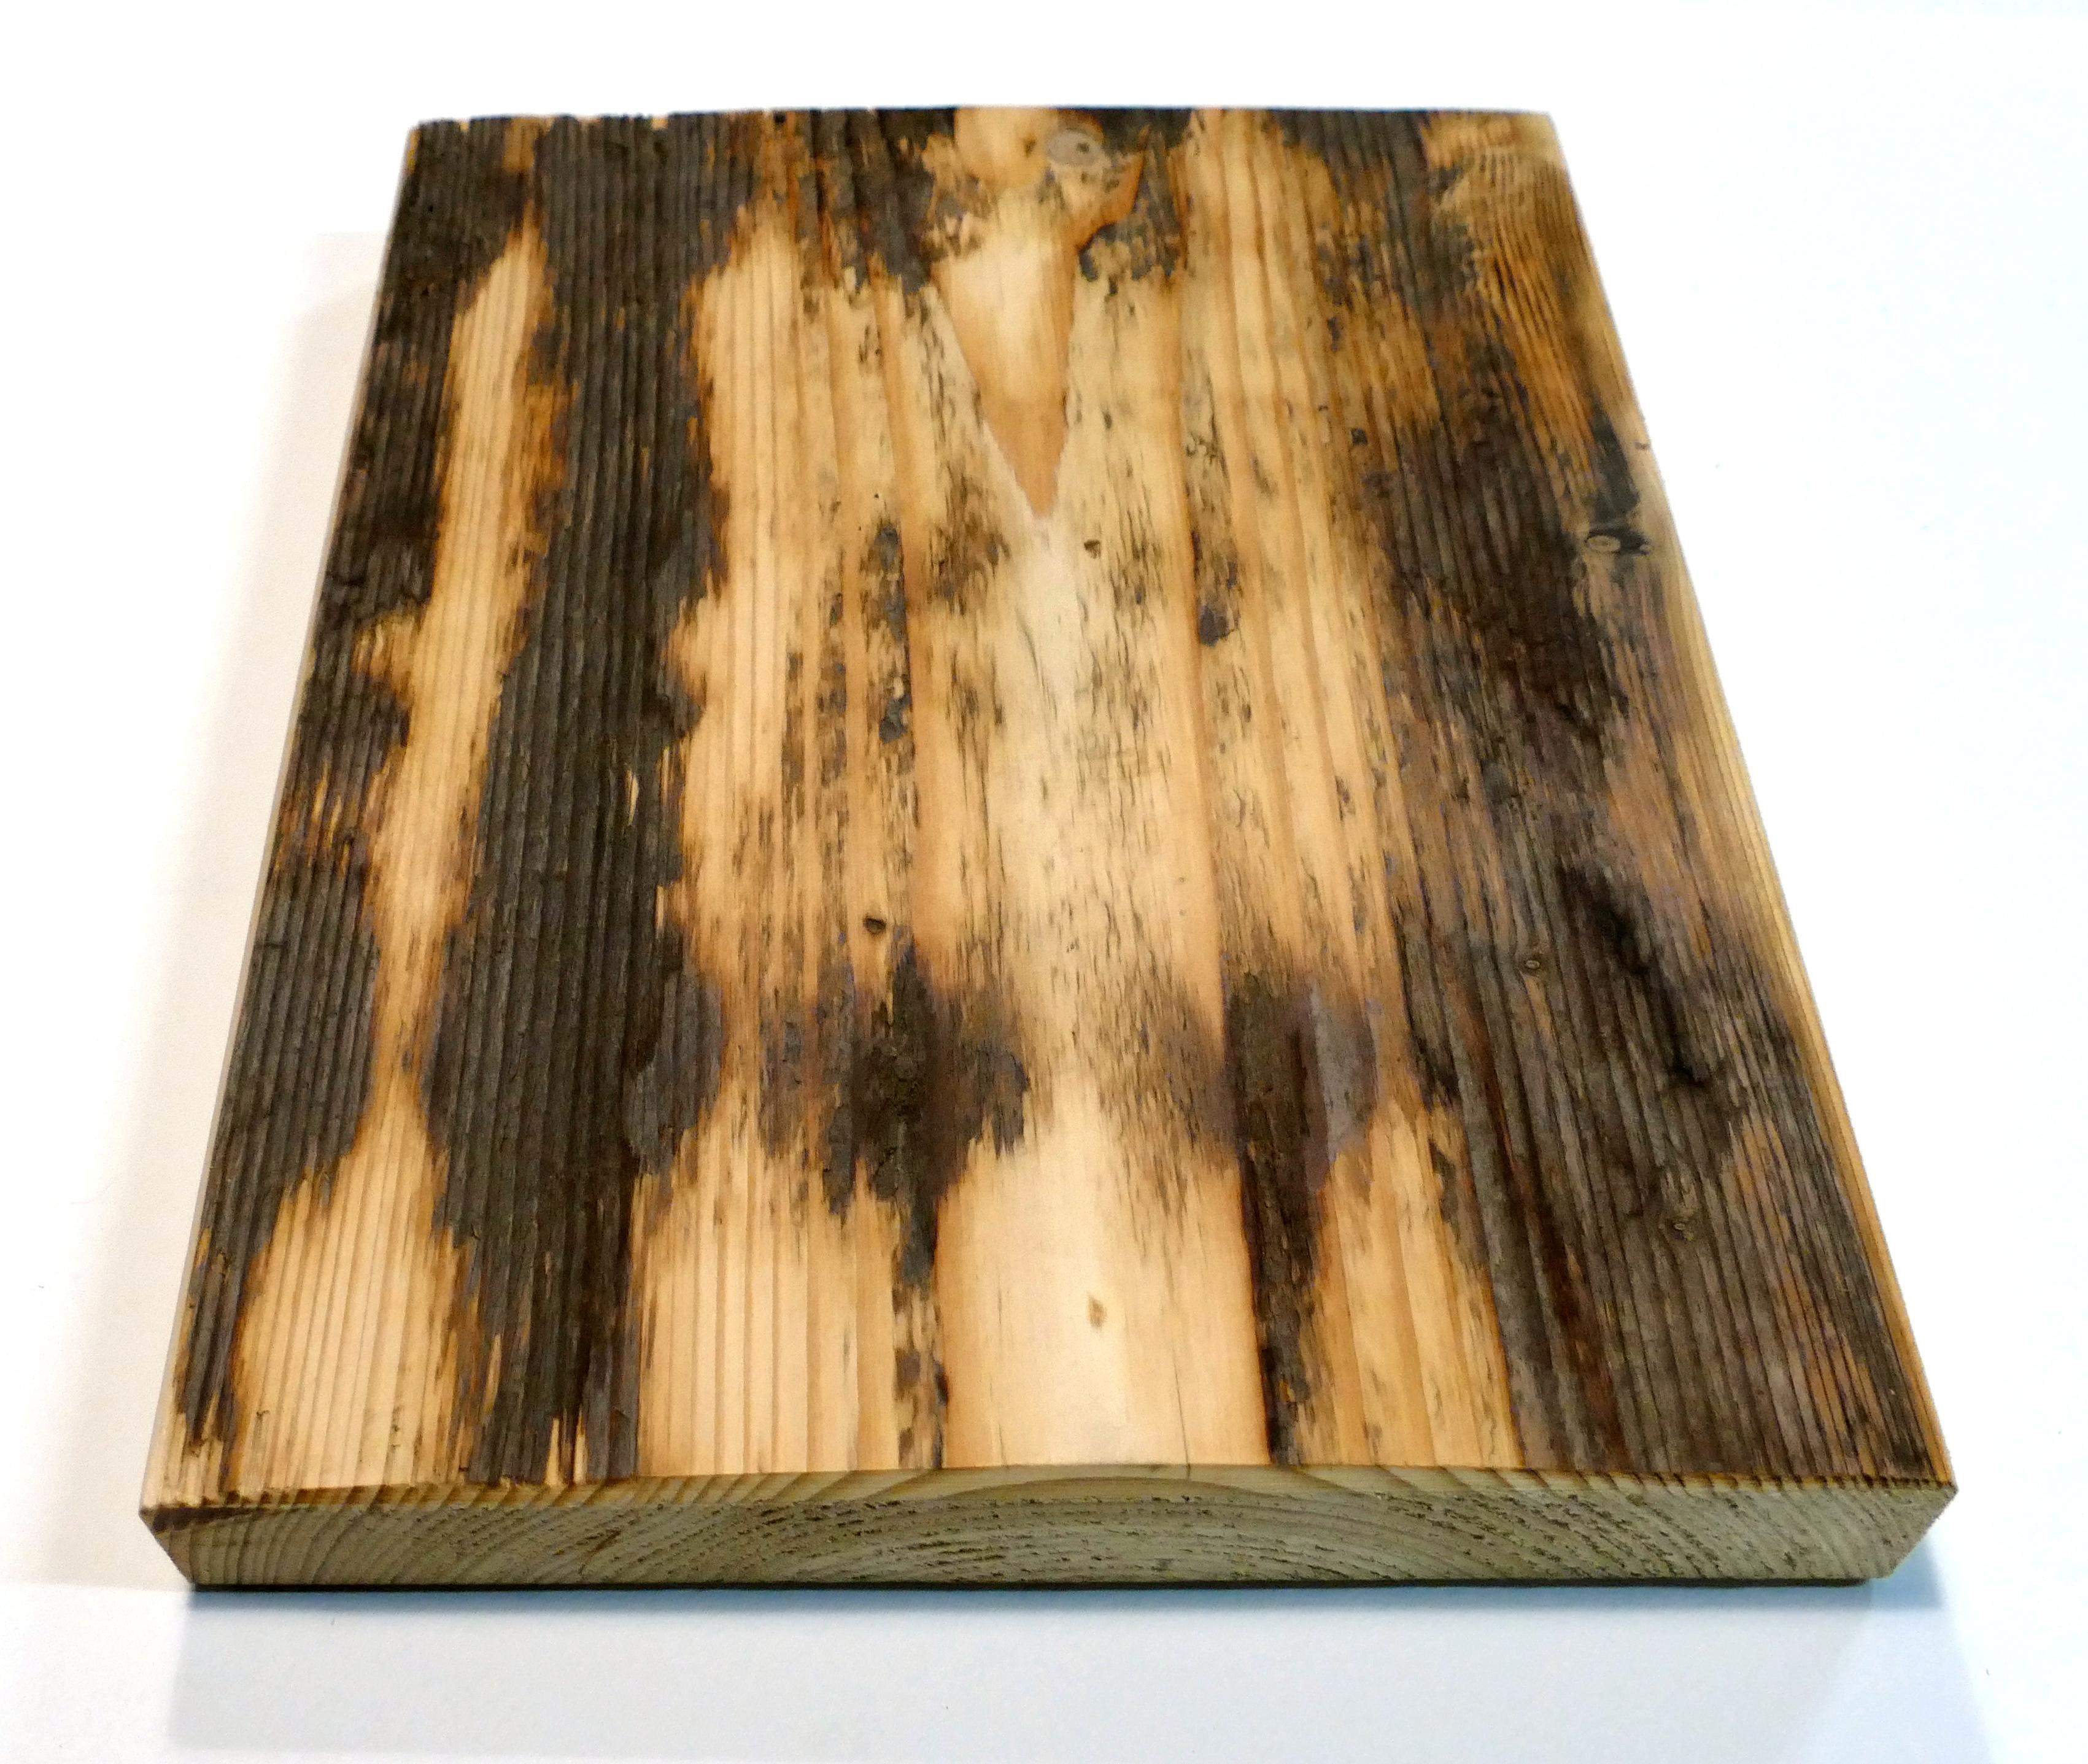 Altholz Fußbodenbretter